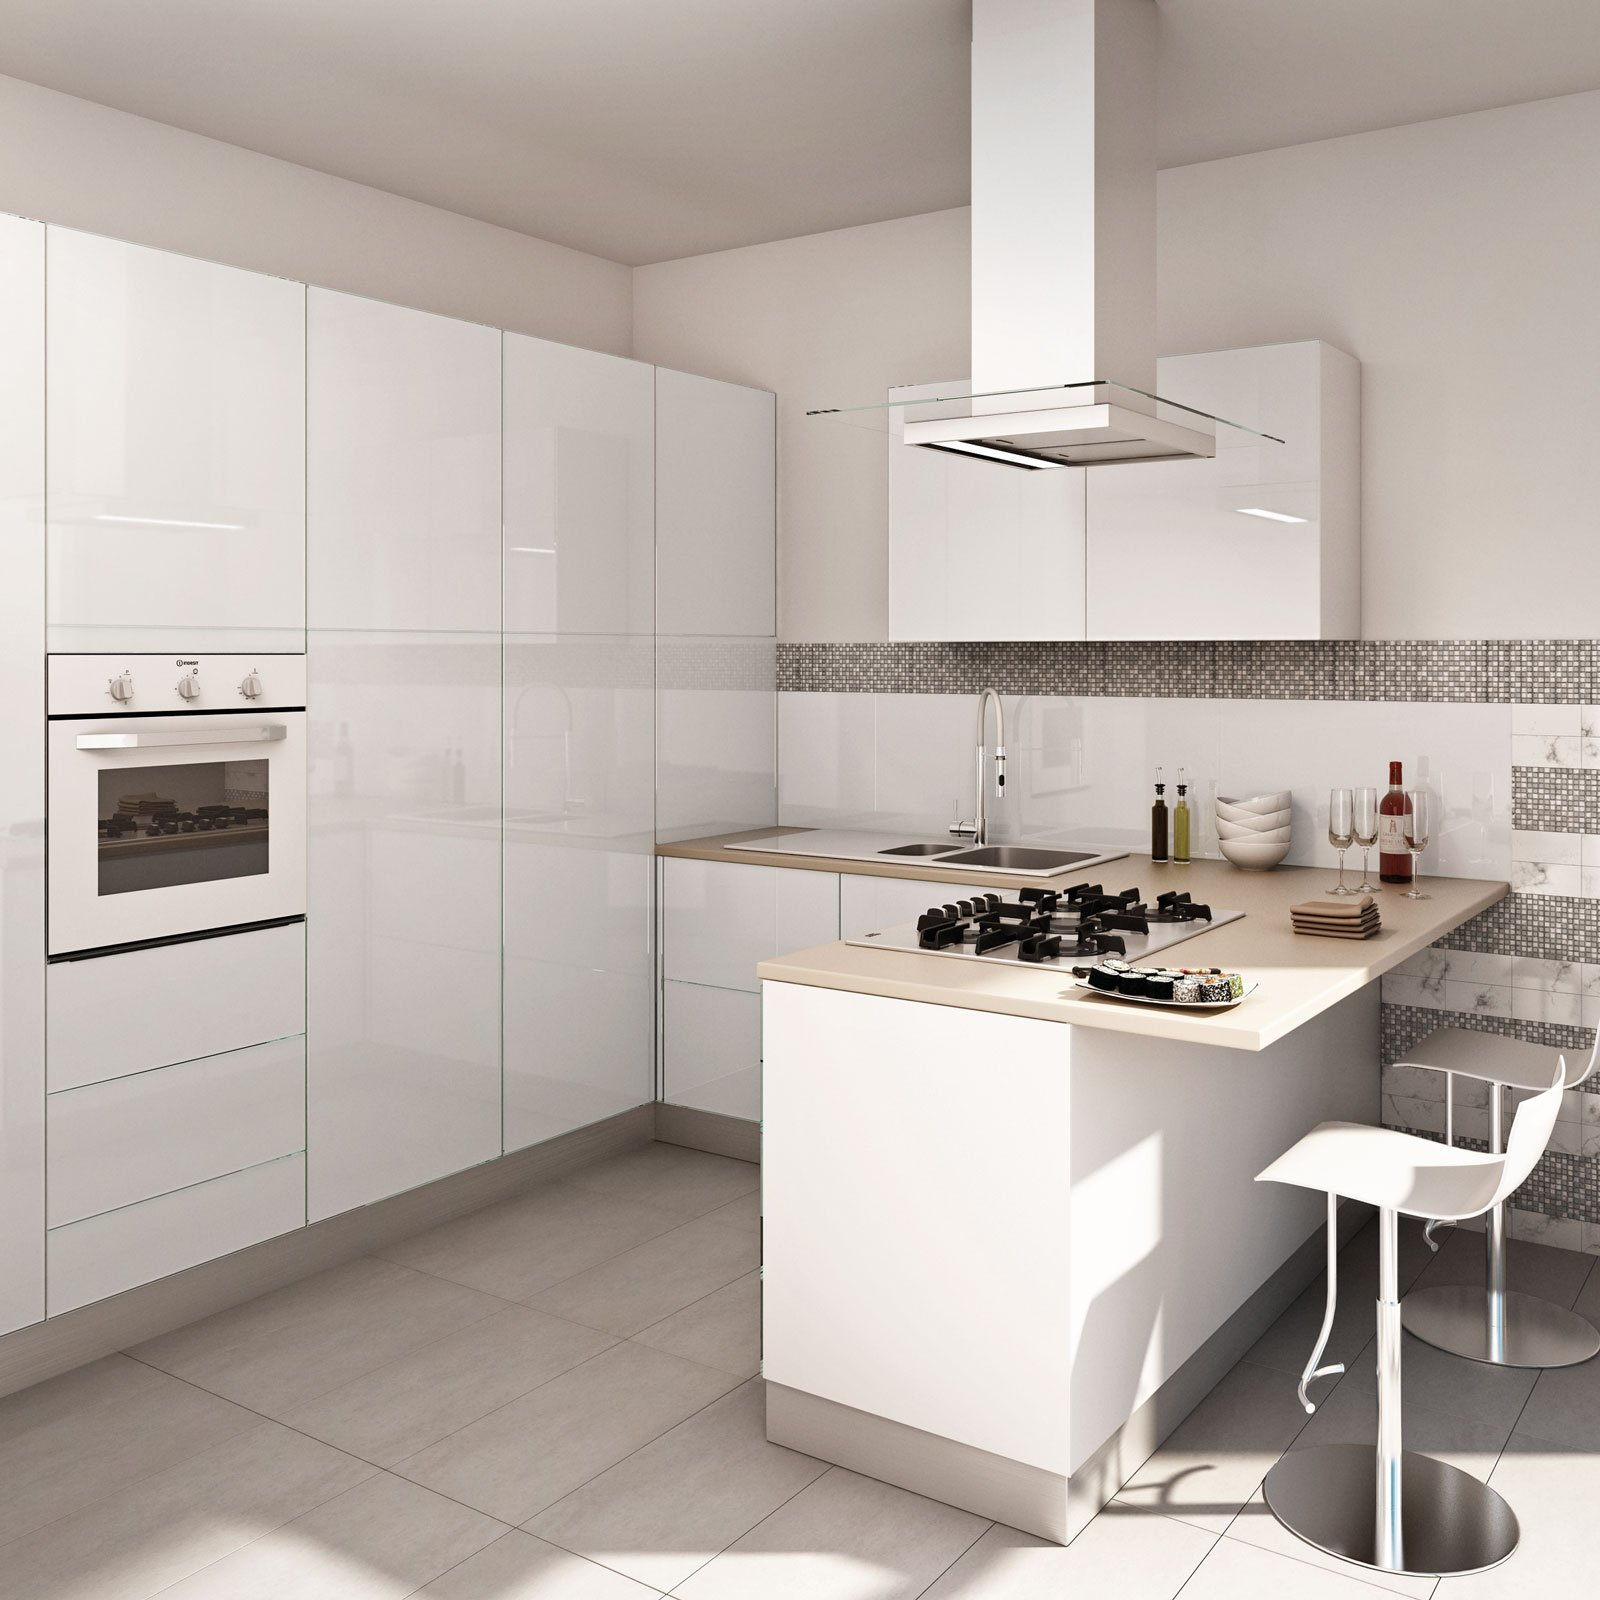 Cucina bianca il fascino eterno della luminosit cose di casa - Cucina tutta bianca ...